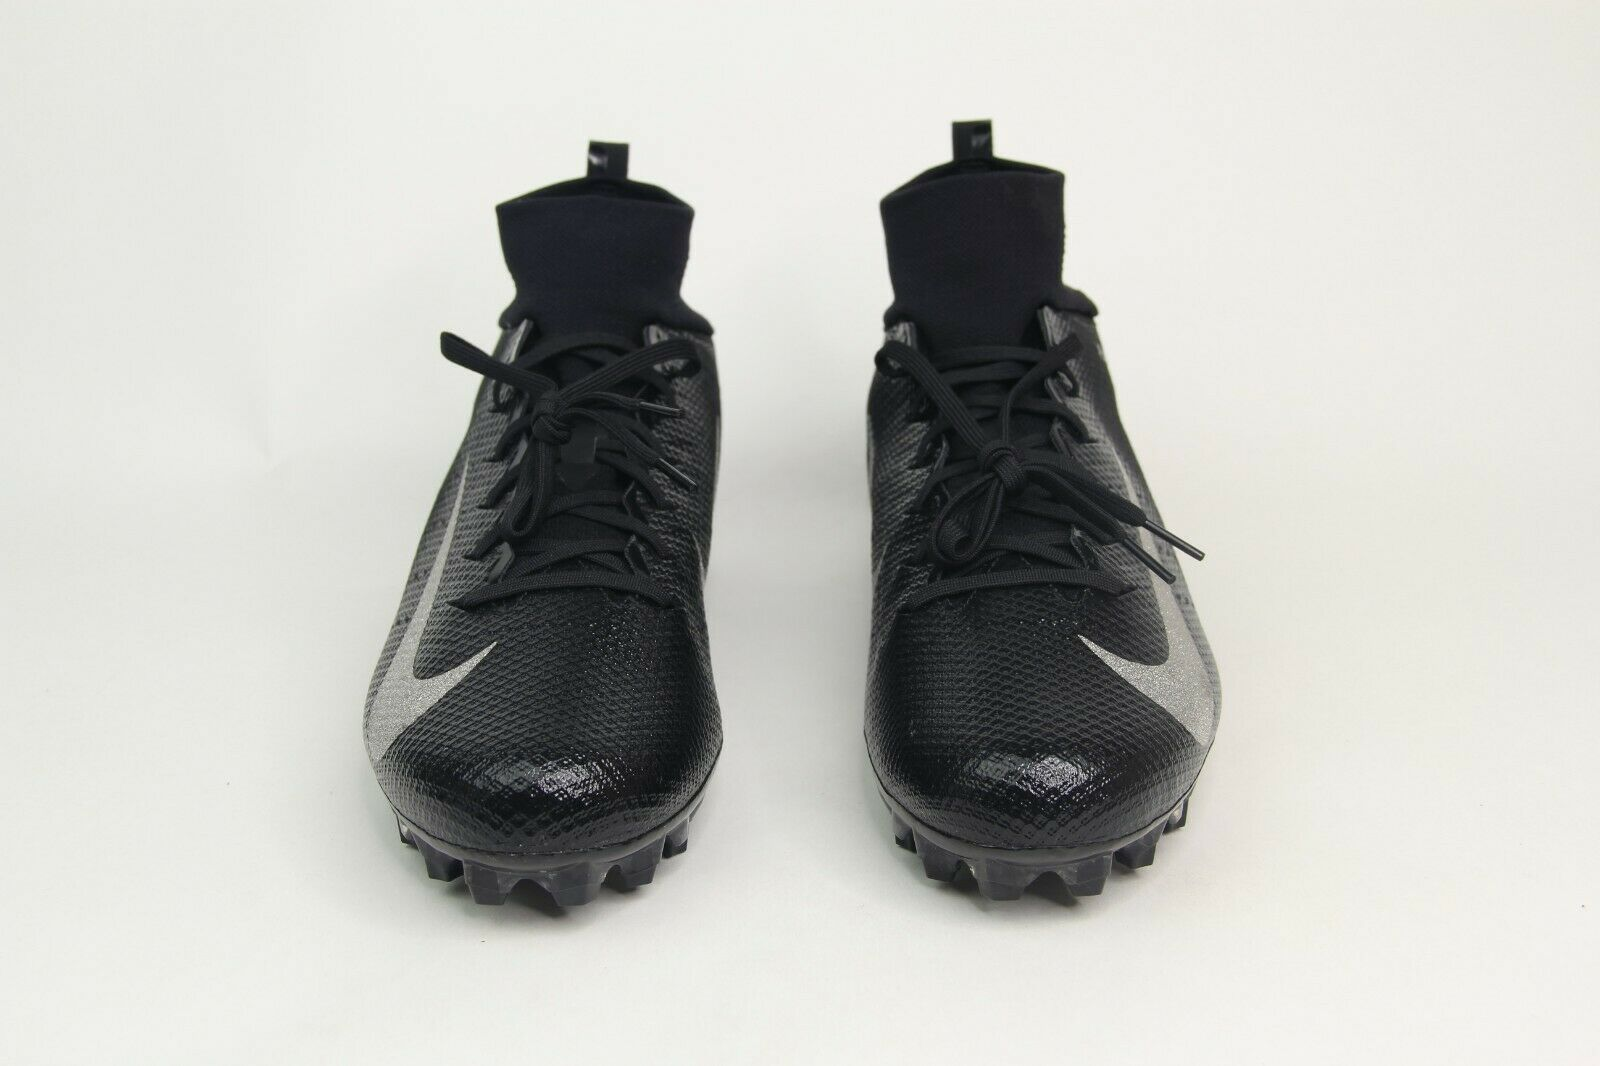 Nike Vapor Untouchable Pro 3 Football Cleats Black Silver 91